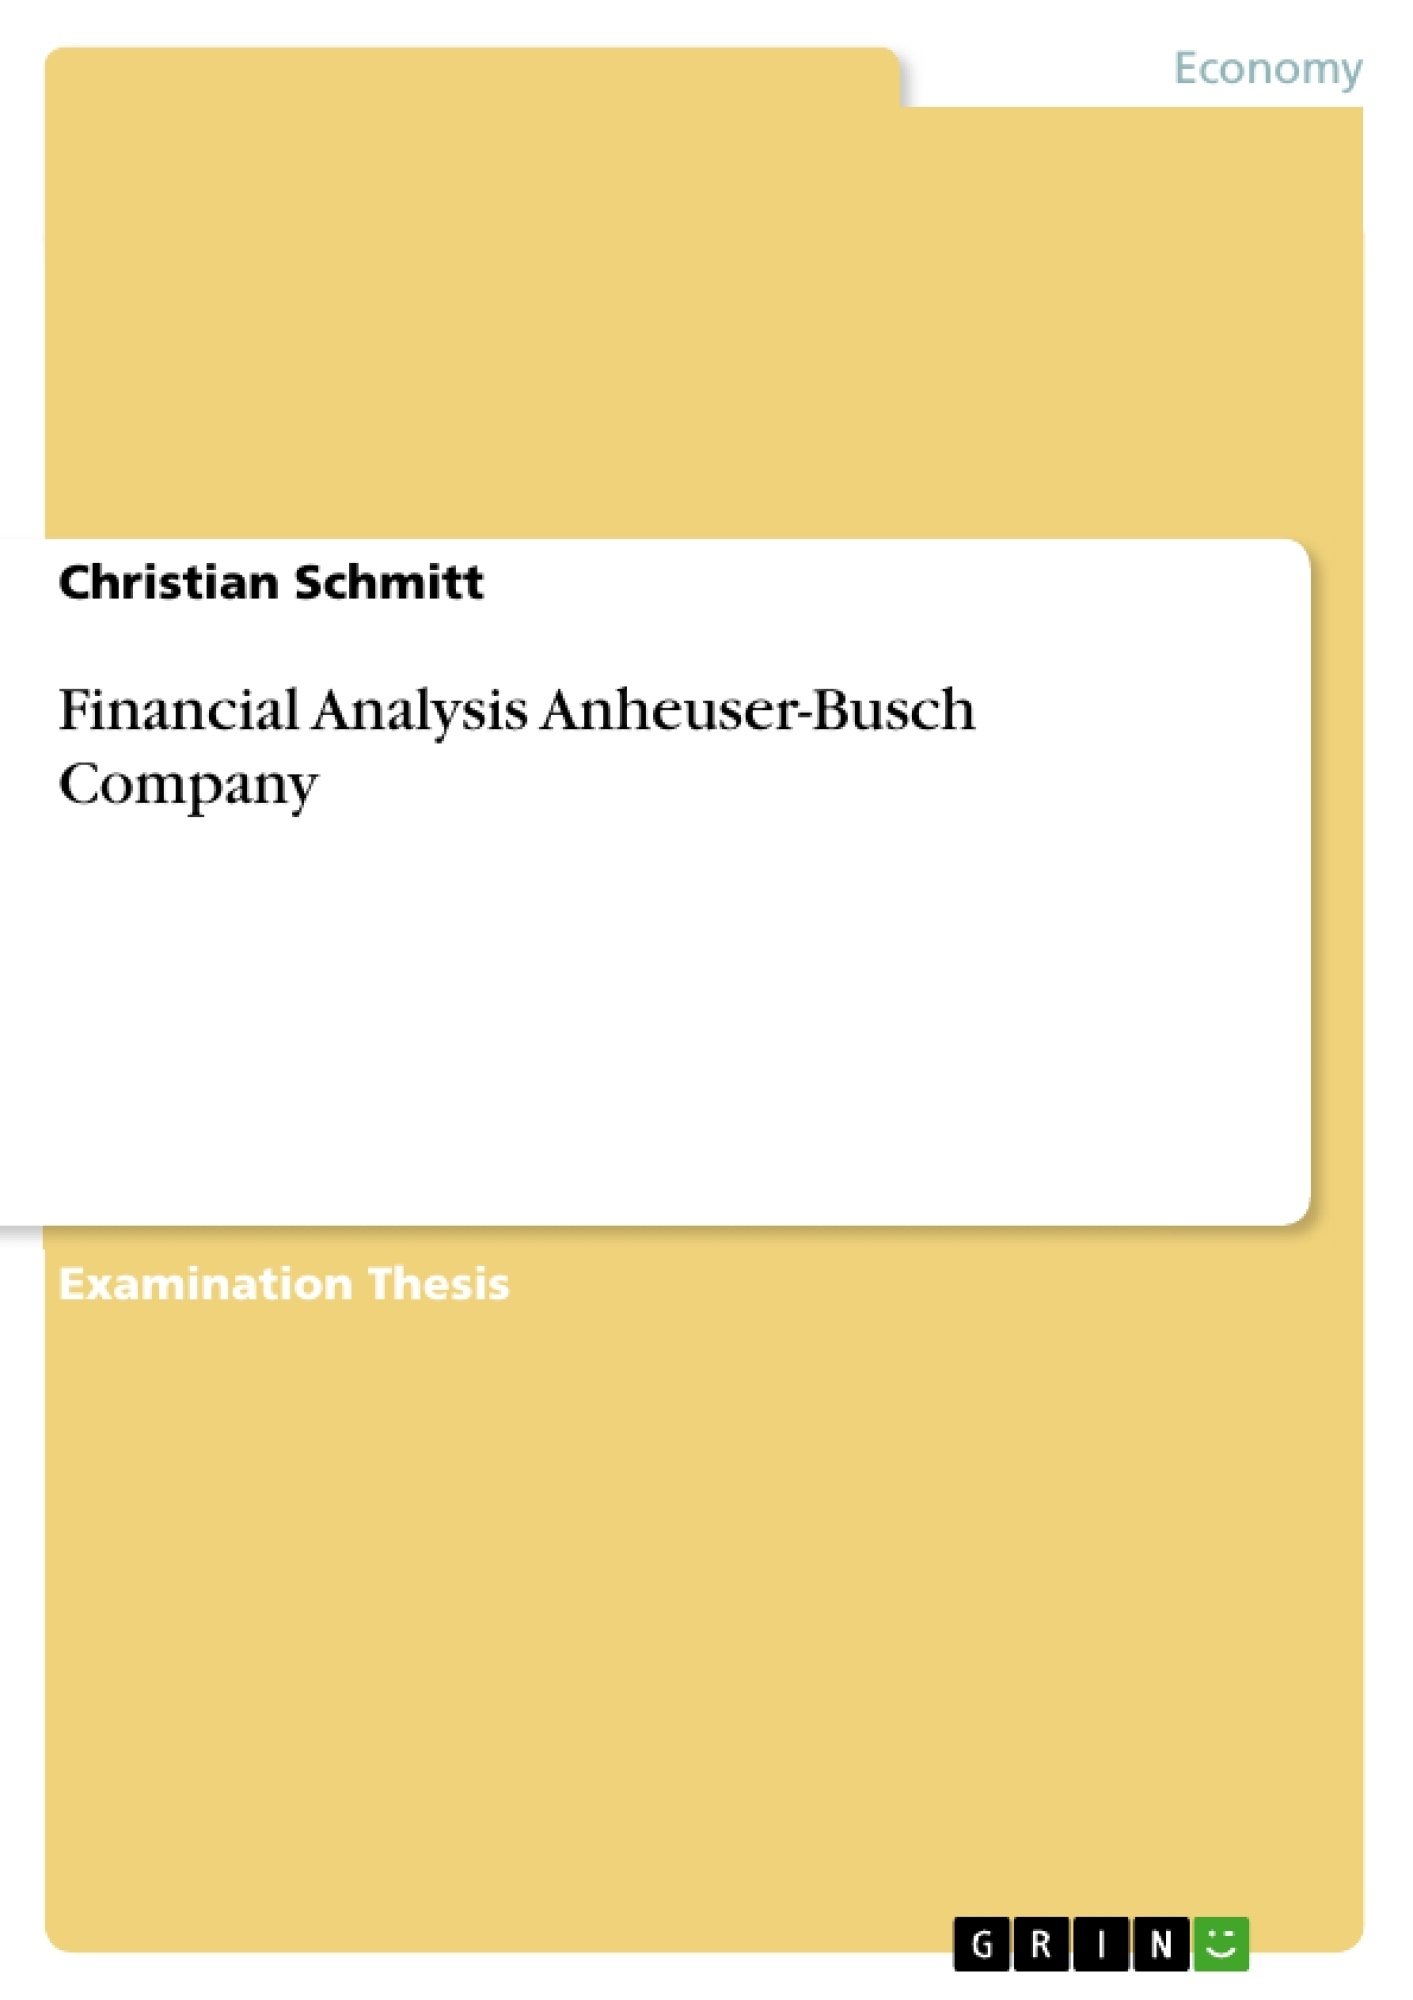 Anheuser-Busch Global Marketing Strategy Essay Sample